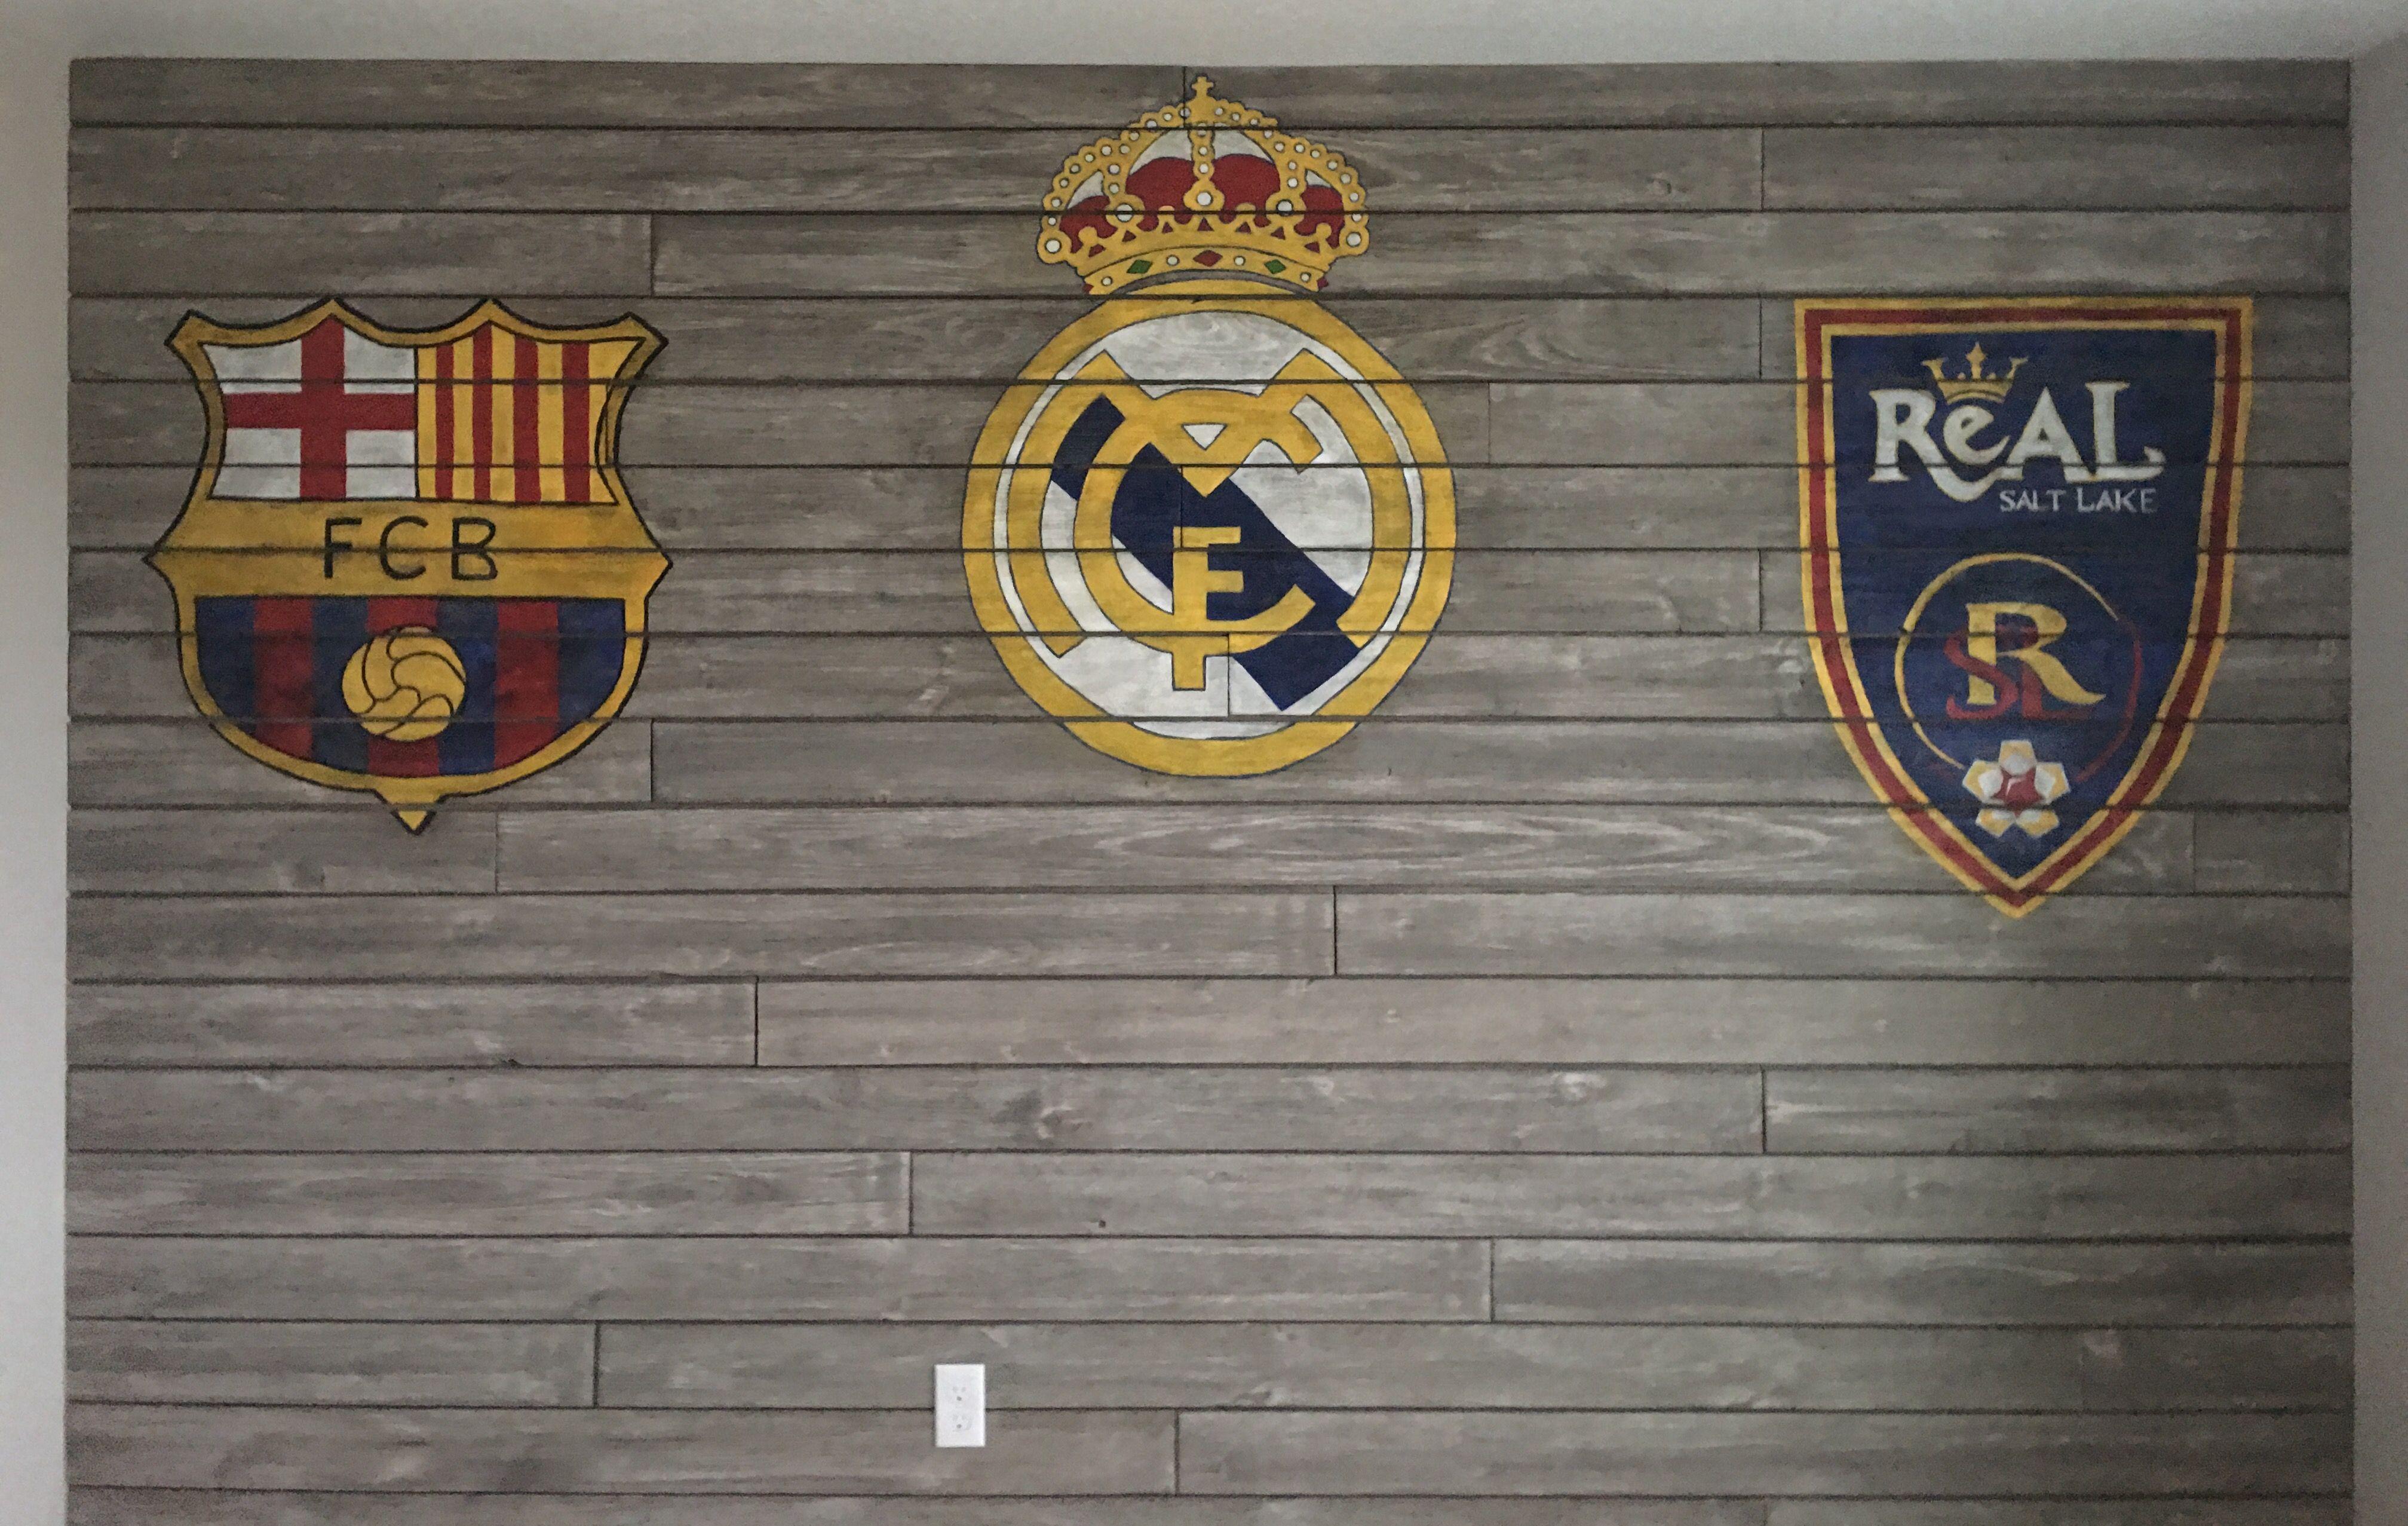 3 soccer logos for a boy's bedroom wall.